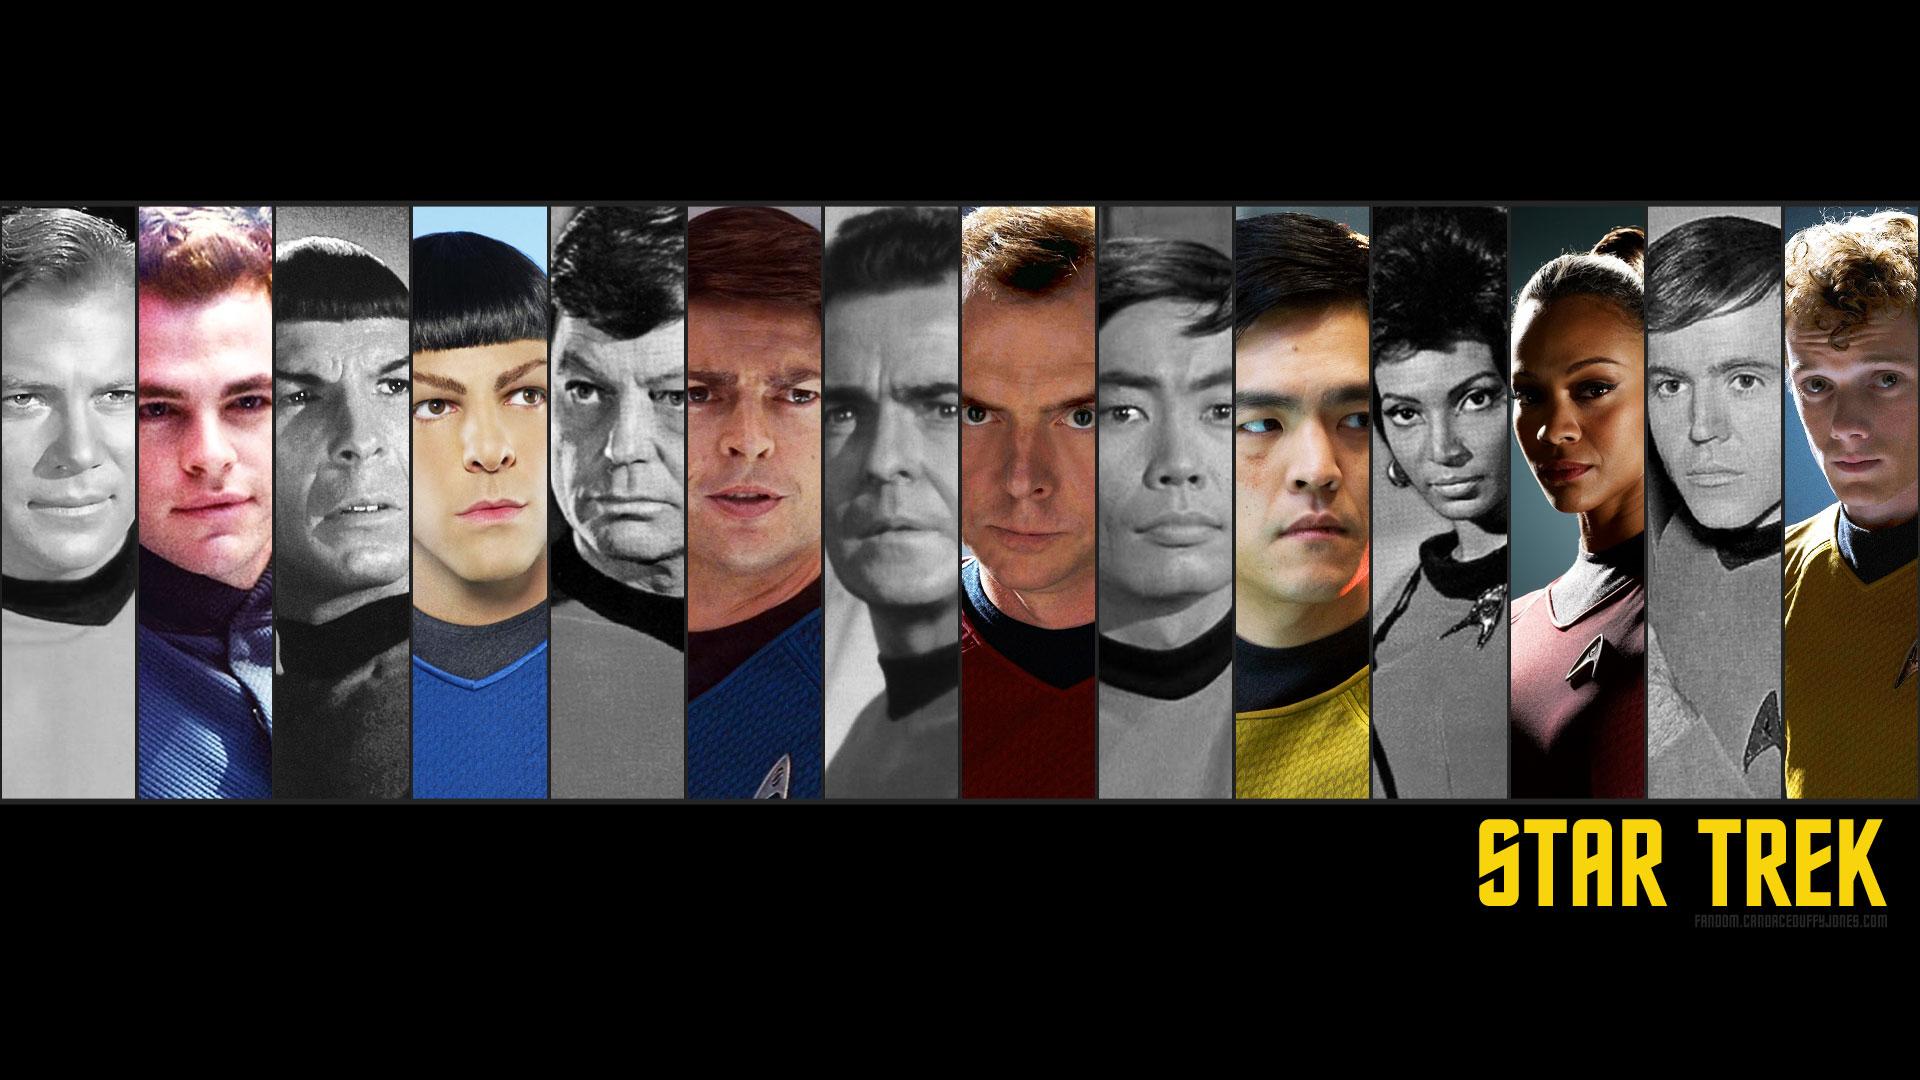 Star Trek Wallpaper   Star Trek Wallpaper 32292834 1920x1080